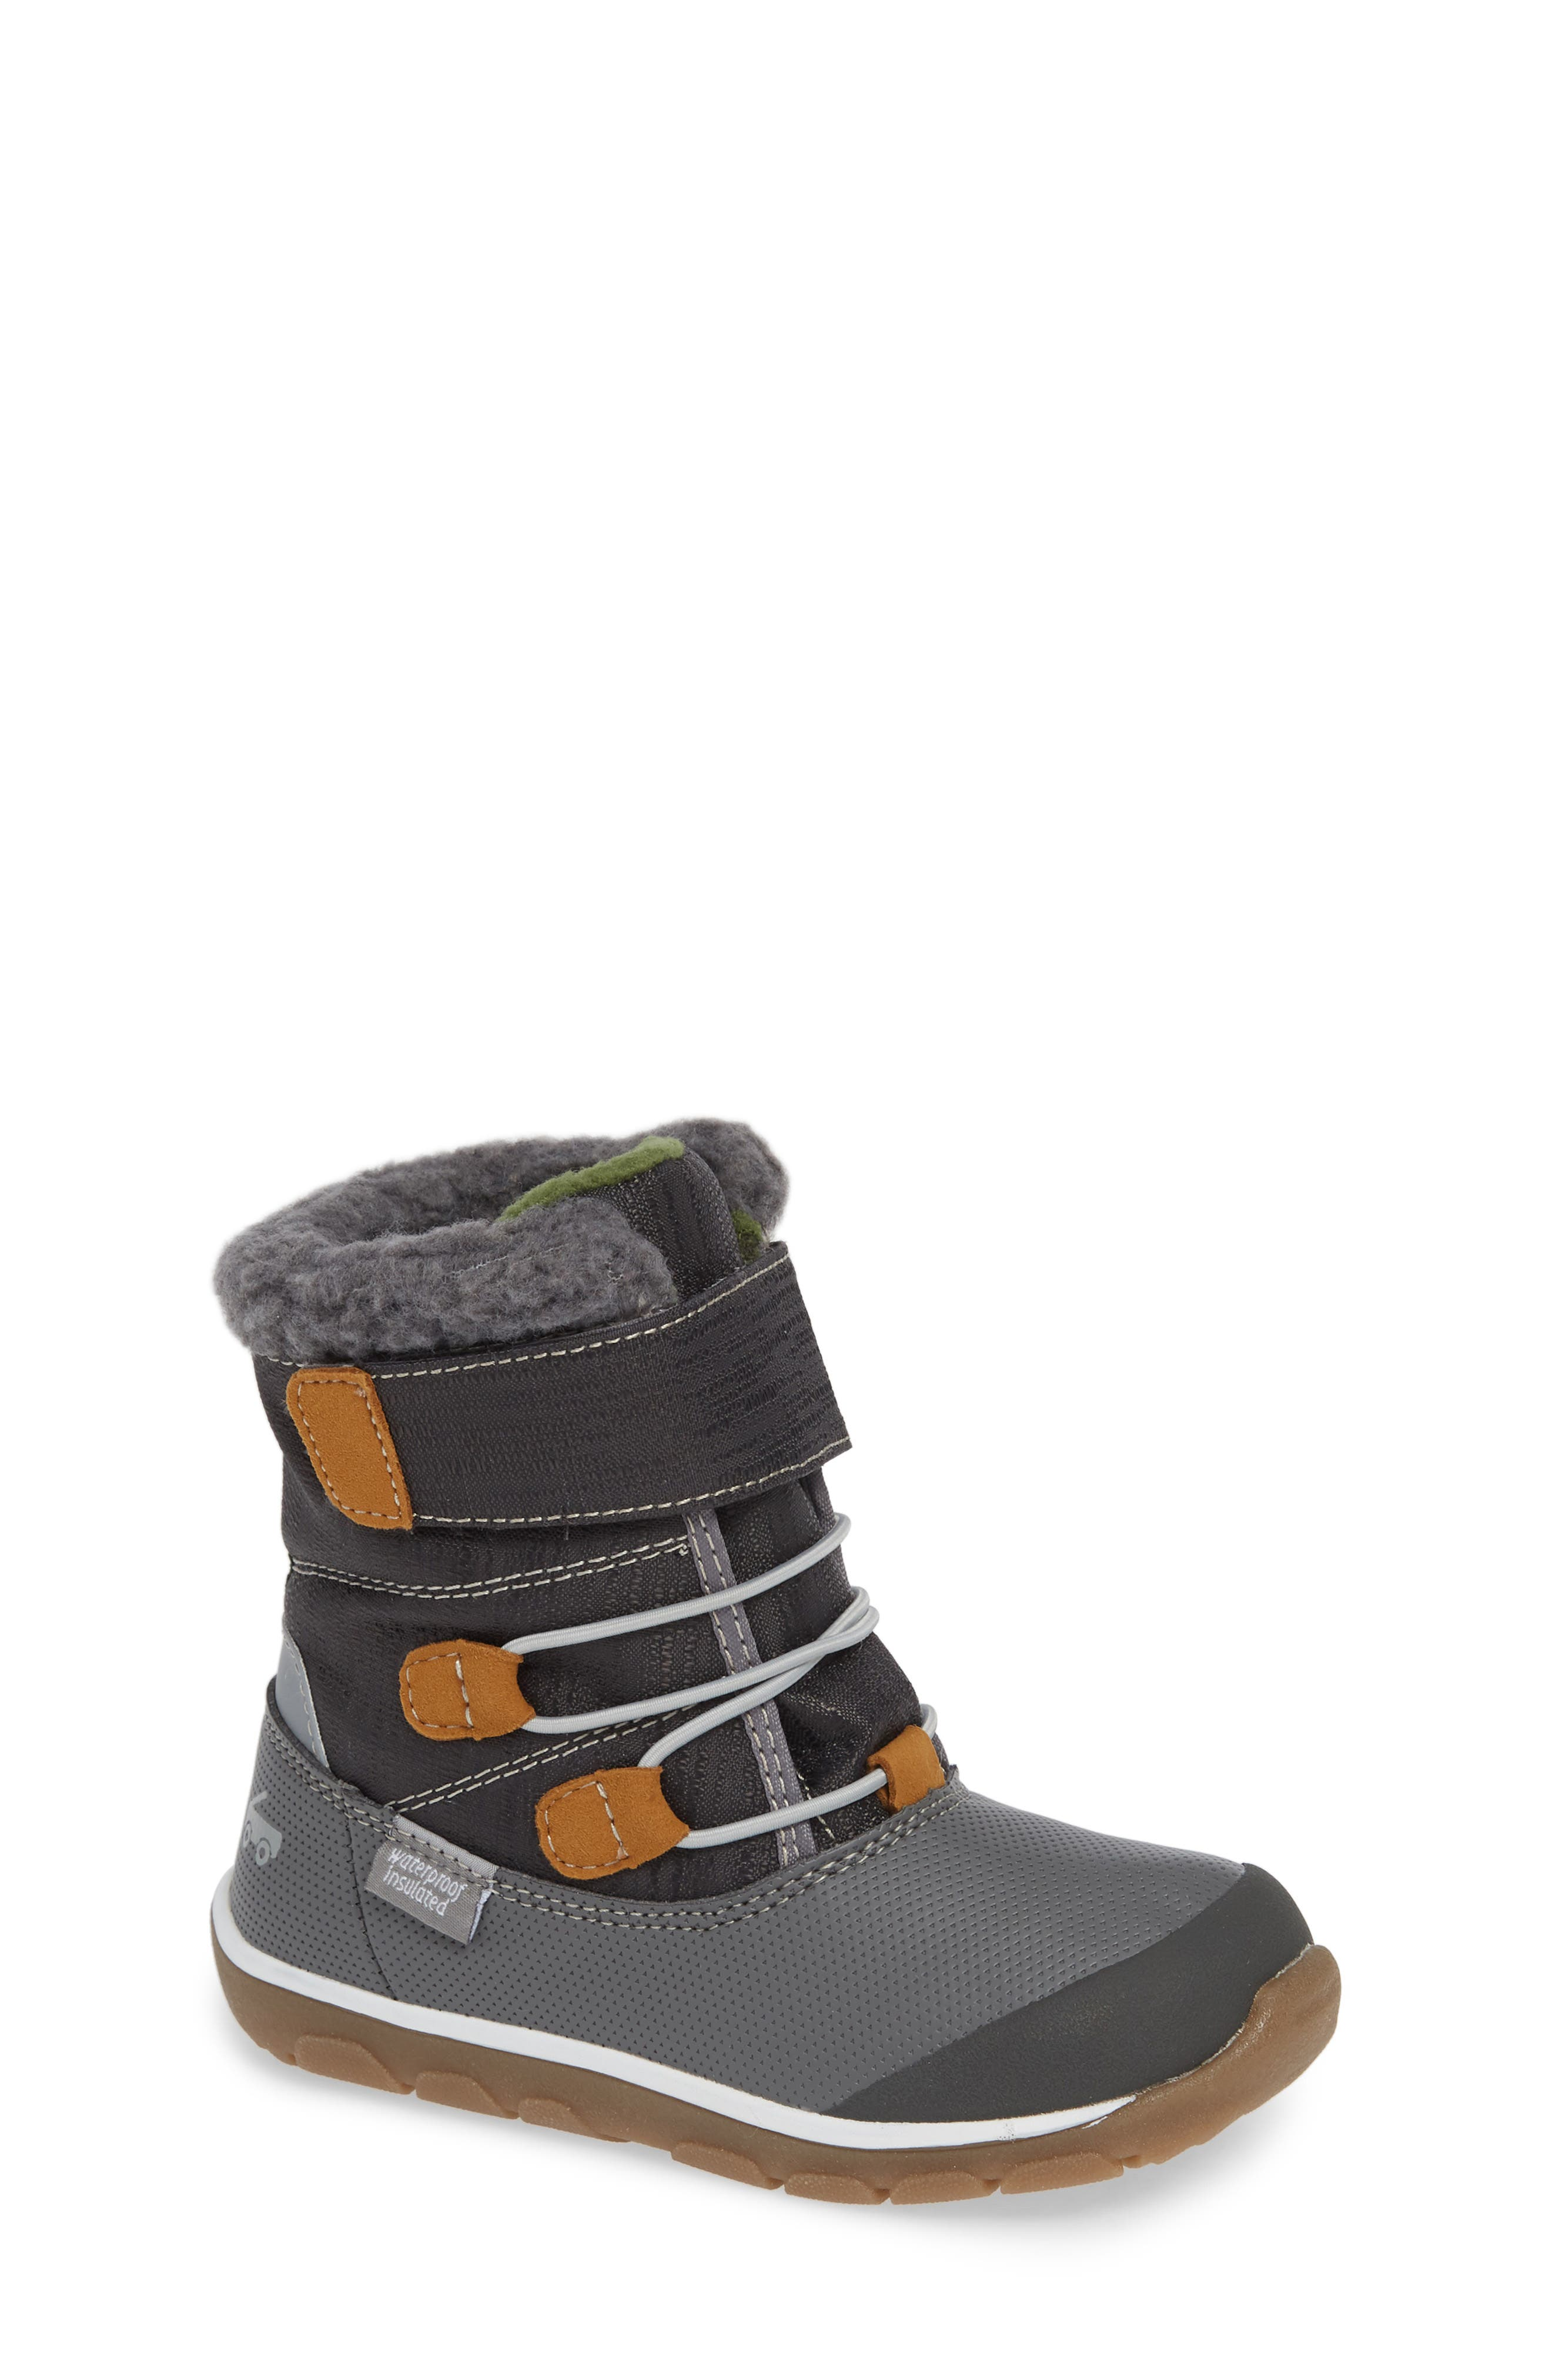 Toddler Girls See Kai Run Gilman Waterproof Insulated Boot Size 5 M  Grey